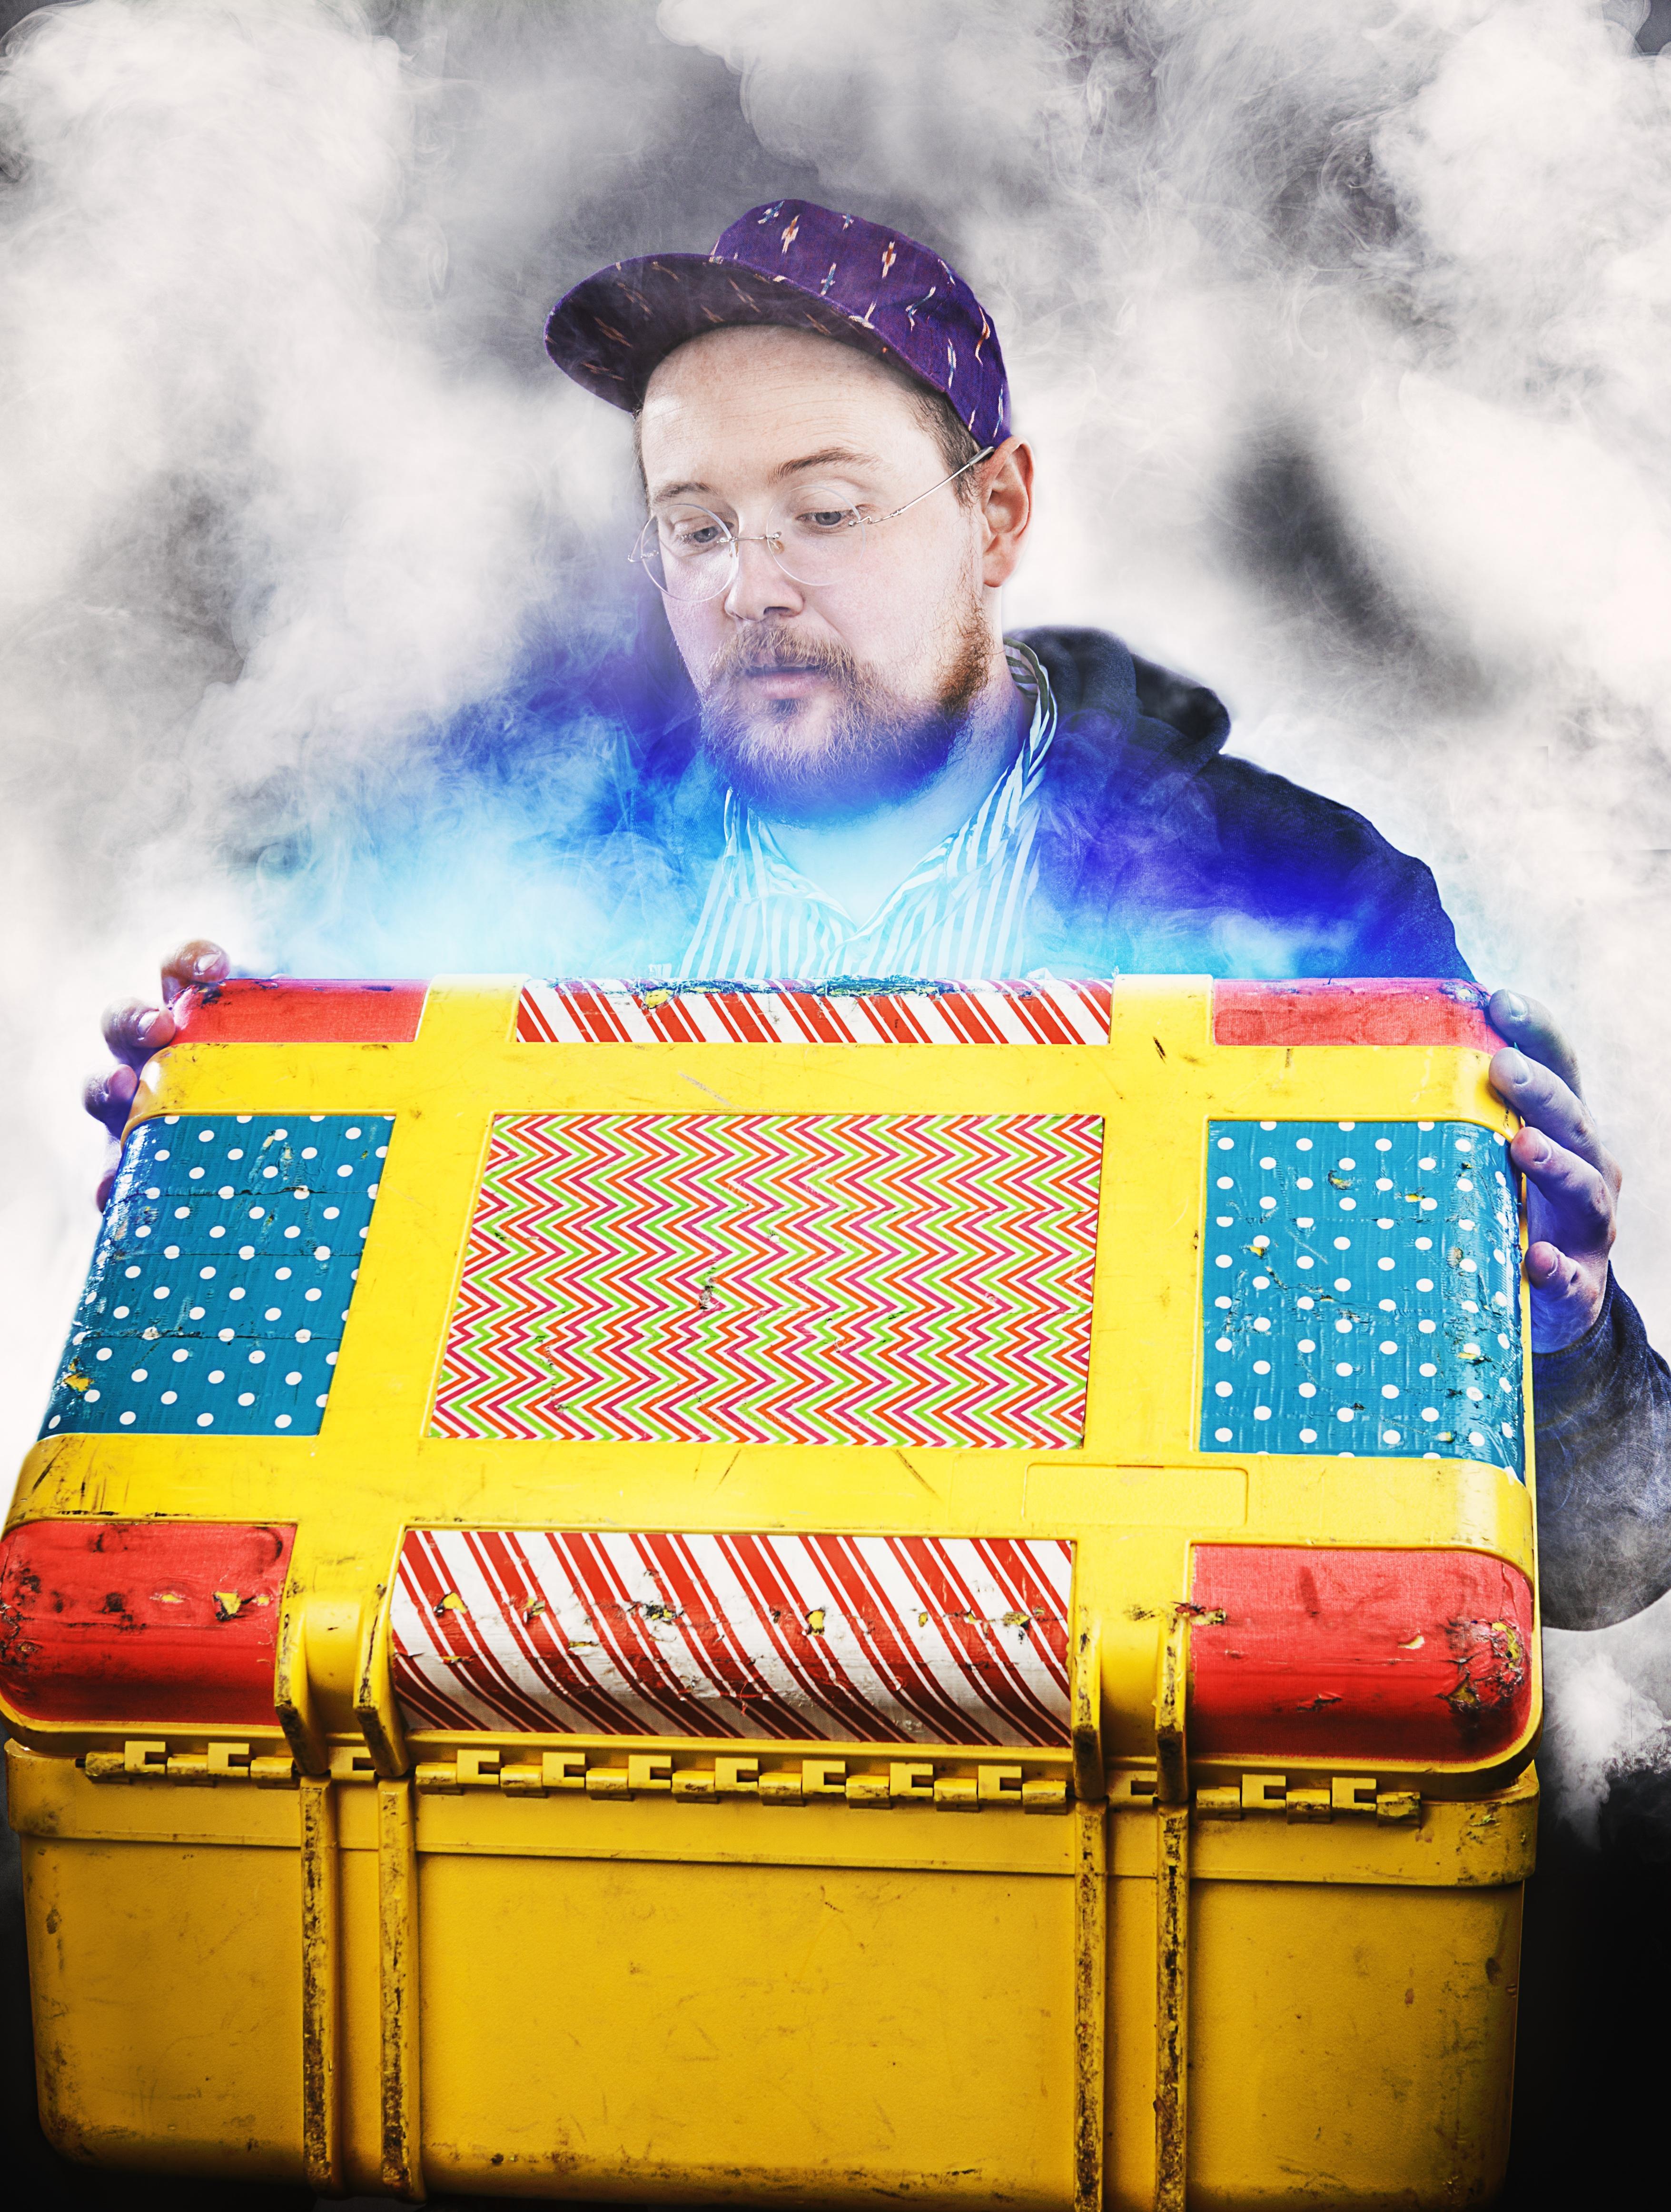 Photo of white smoke engulfing man looking in a box